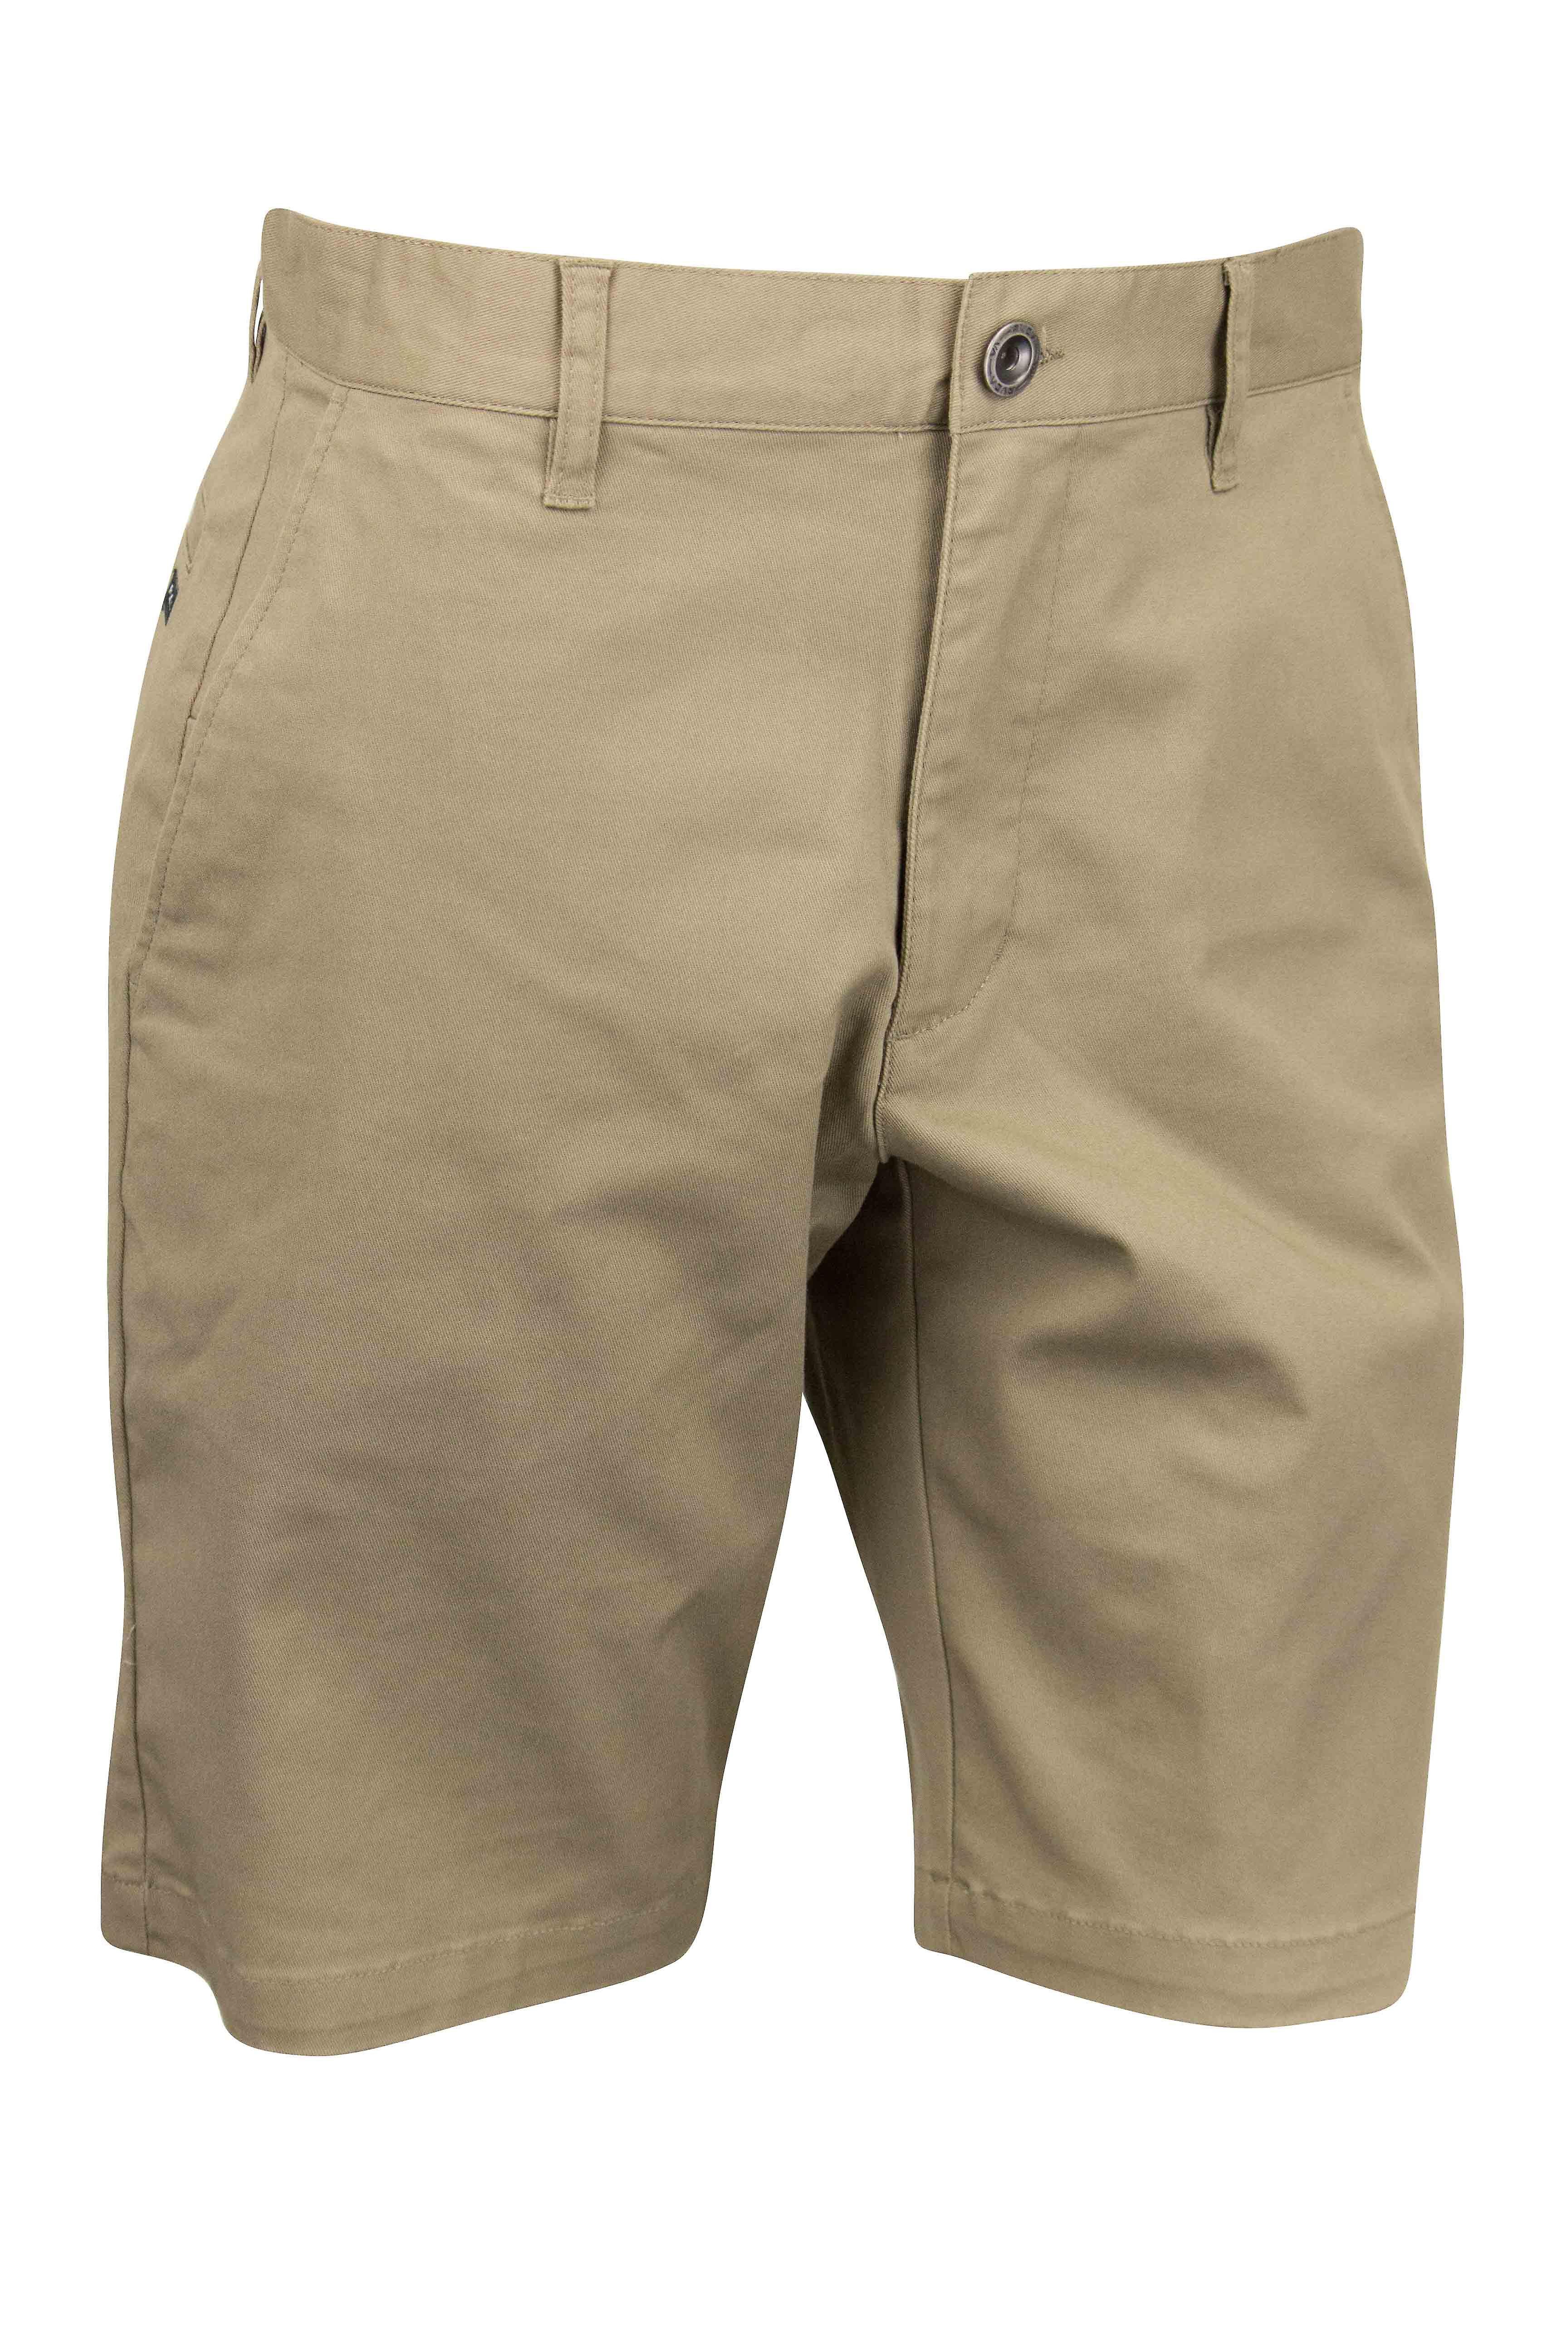 RVCA Mens VA Sport Weekend Stretch Casual Chino Shorts - Dark Khaki